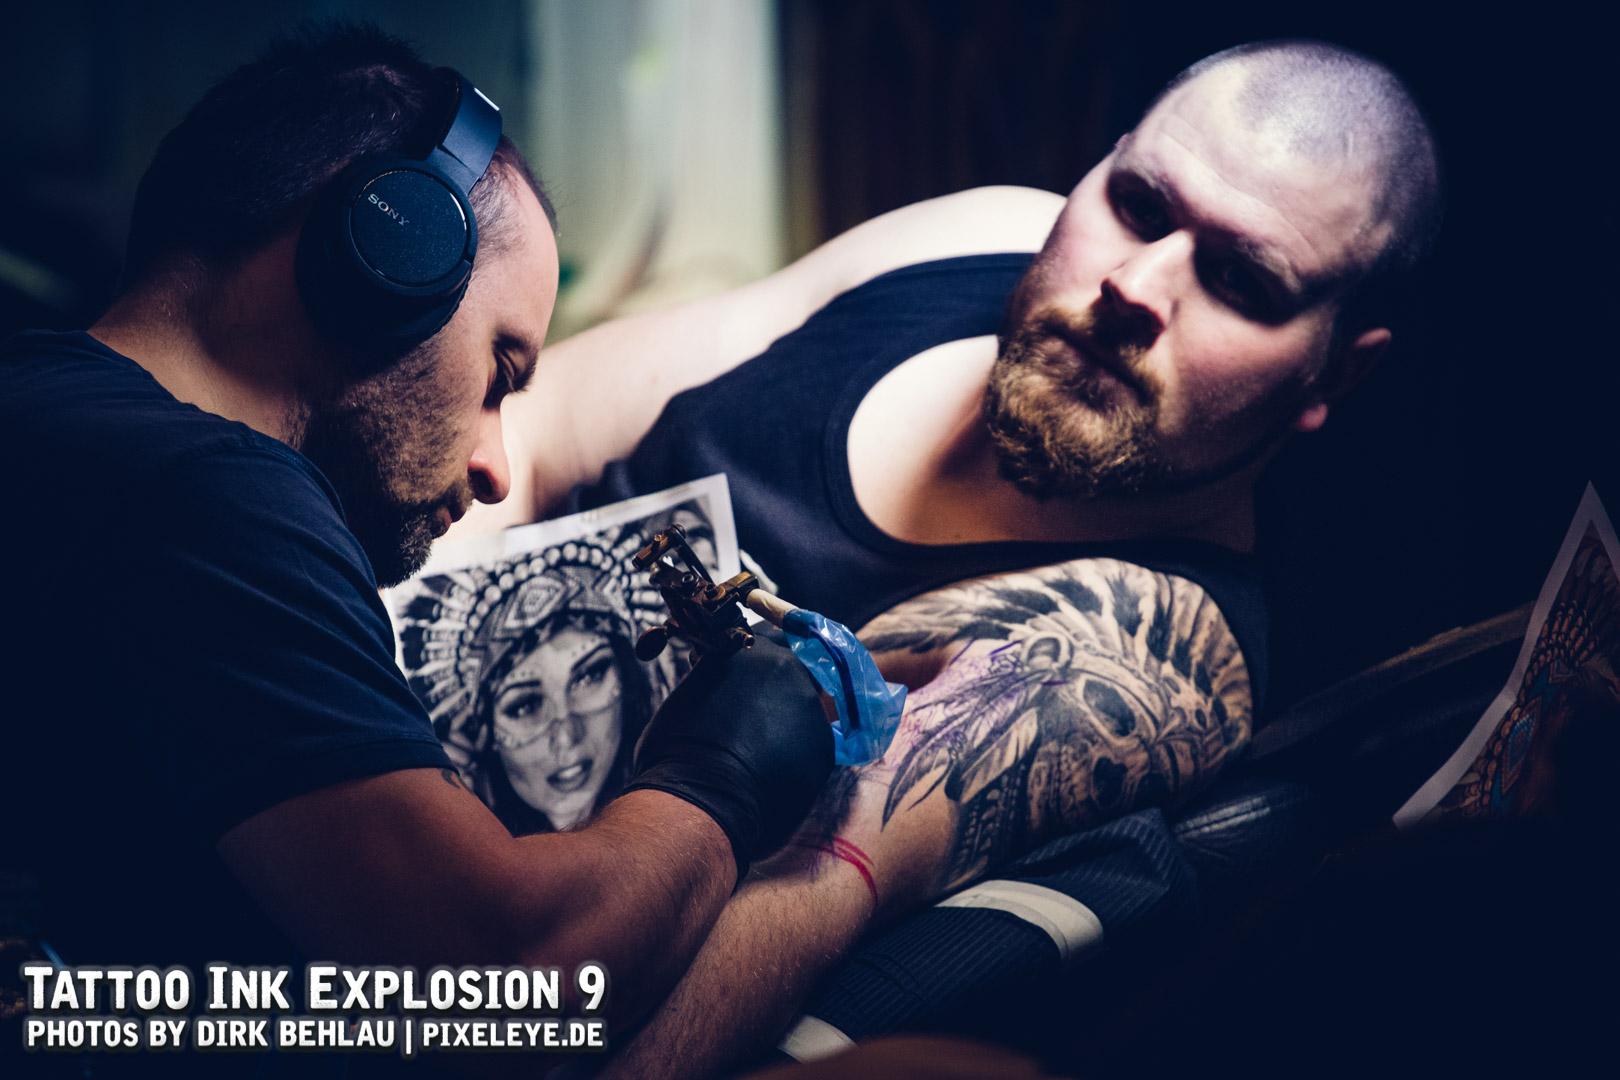 Tattoo Ink Explosion 2018 WEB by Dirk Behlau-1342.jpg